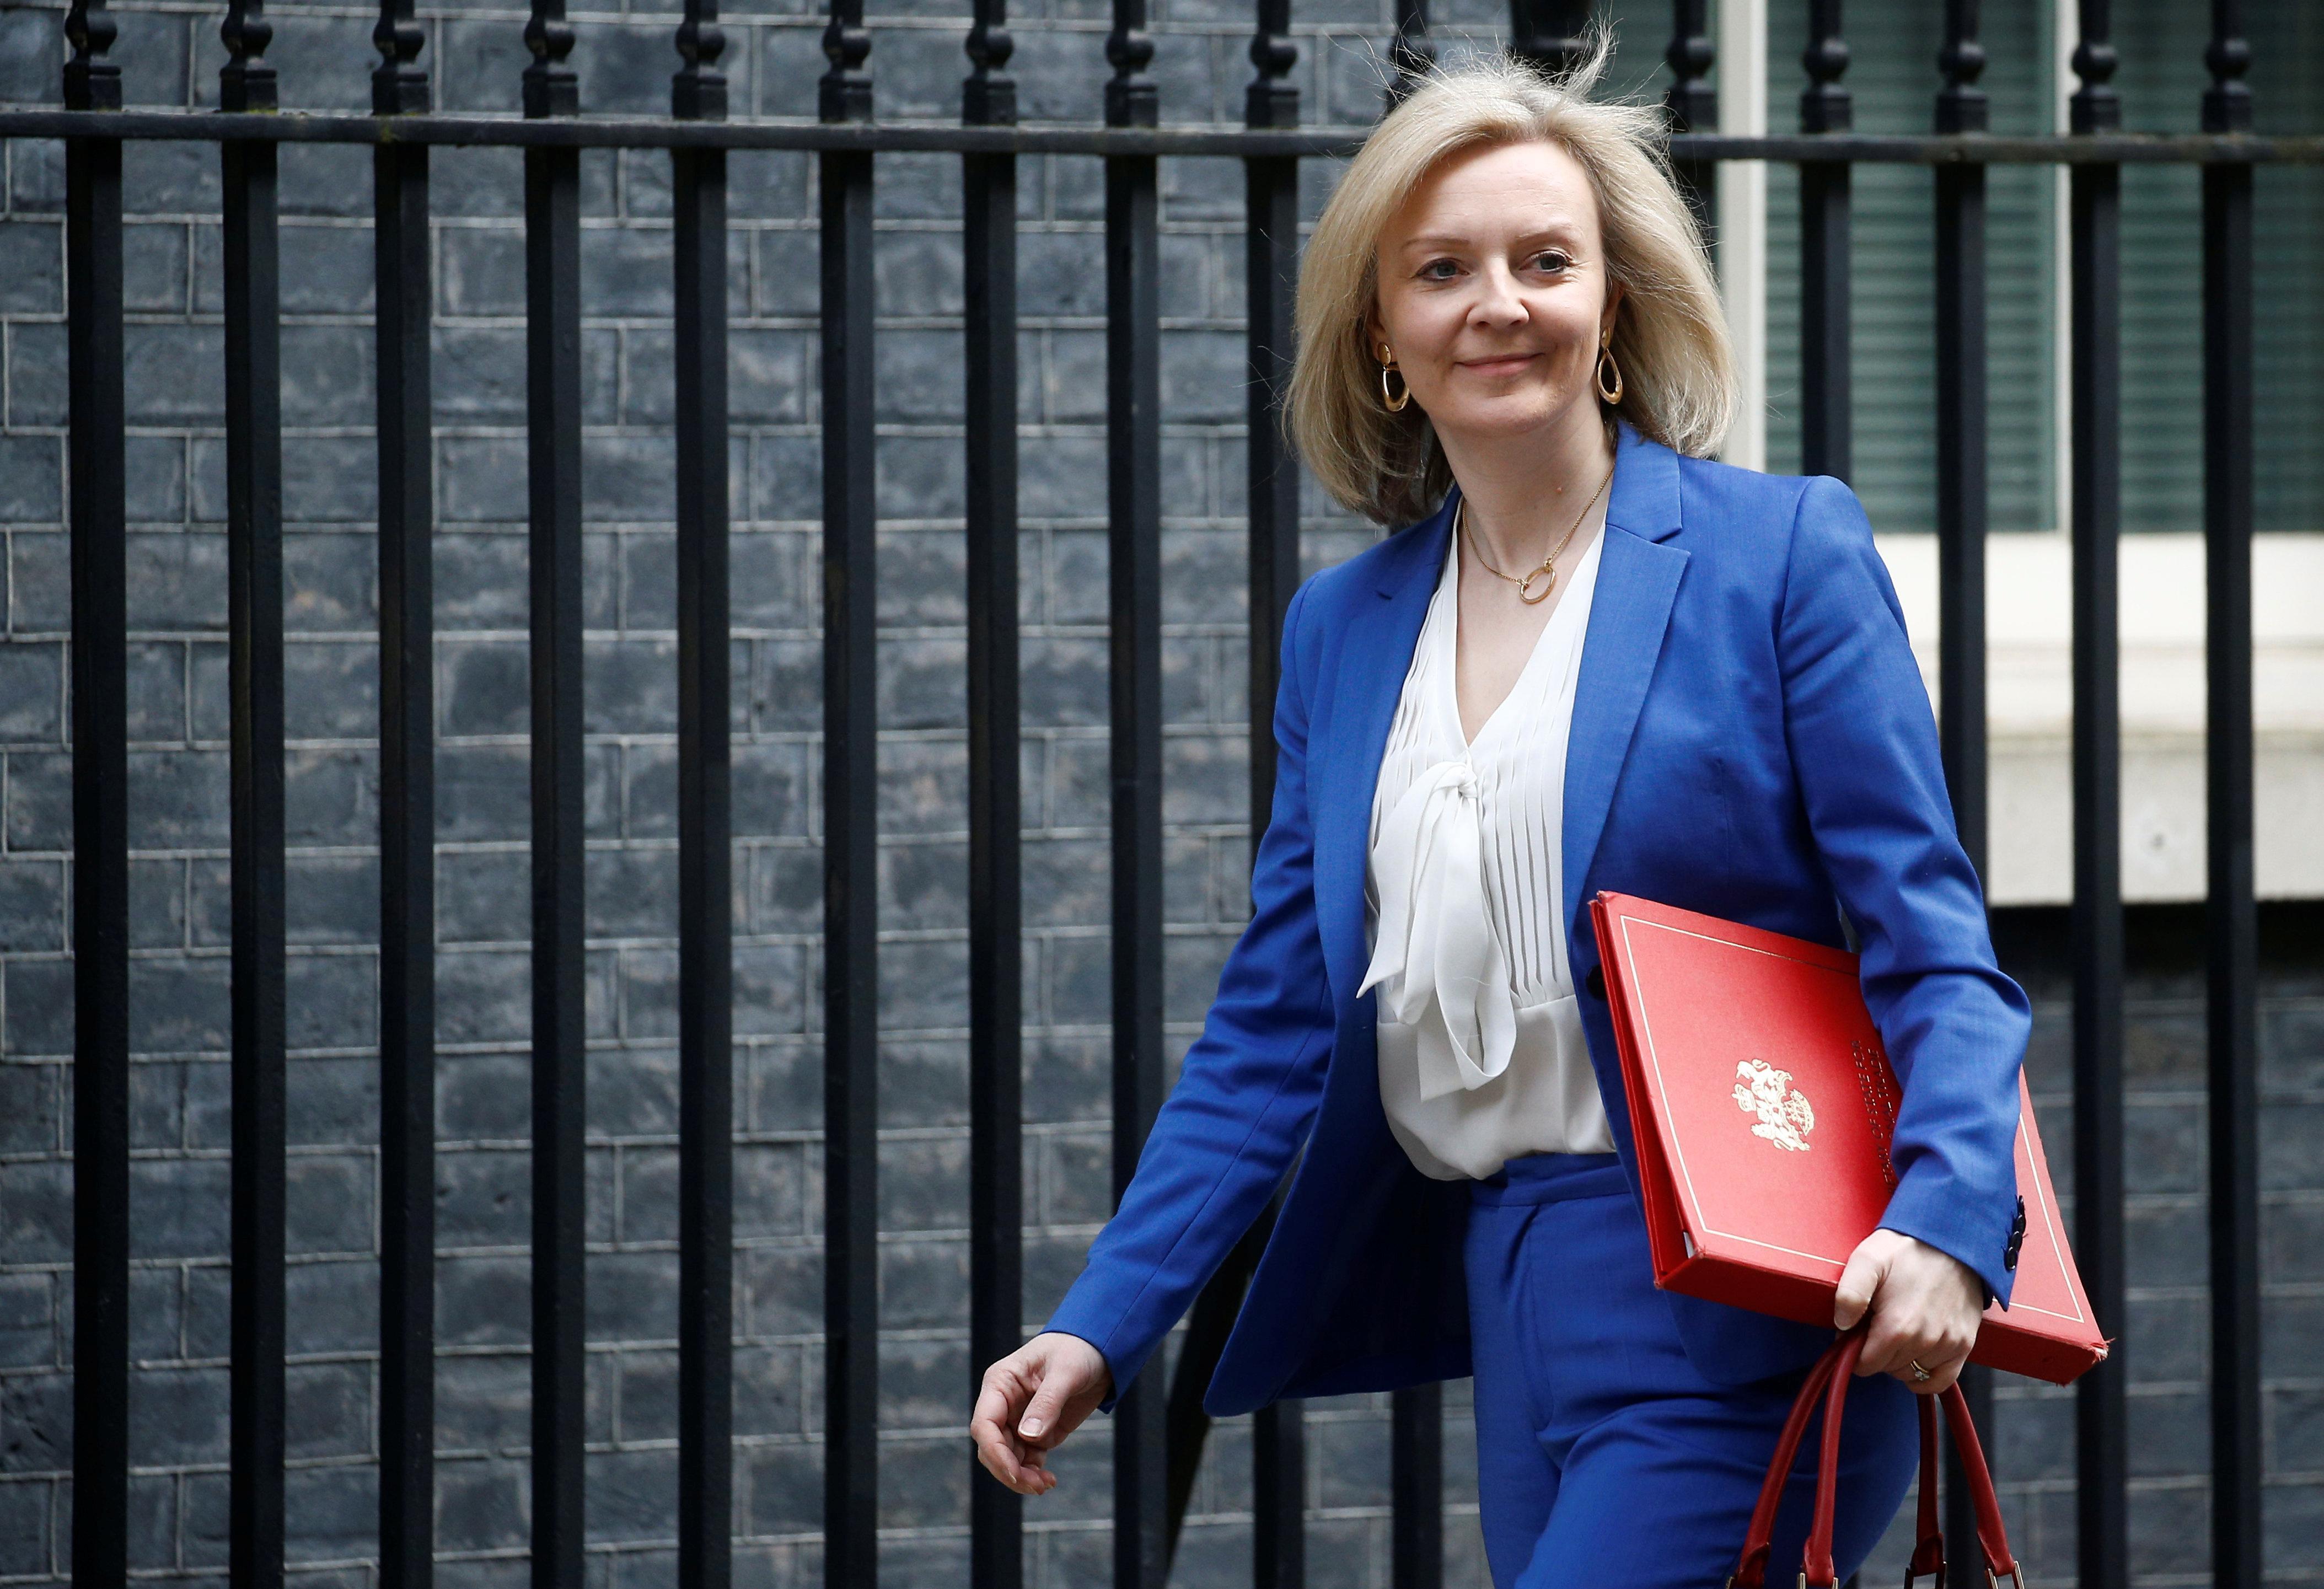 British trade minister to meet top U.S. officials next week, USTR says